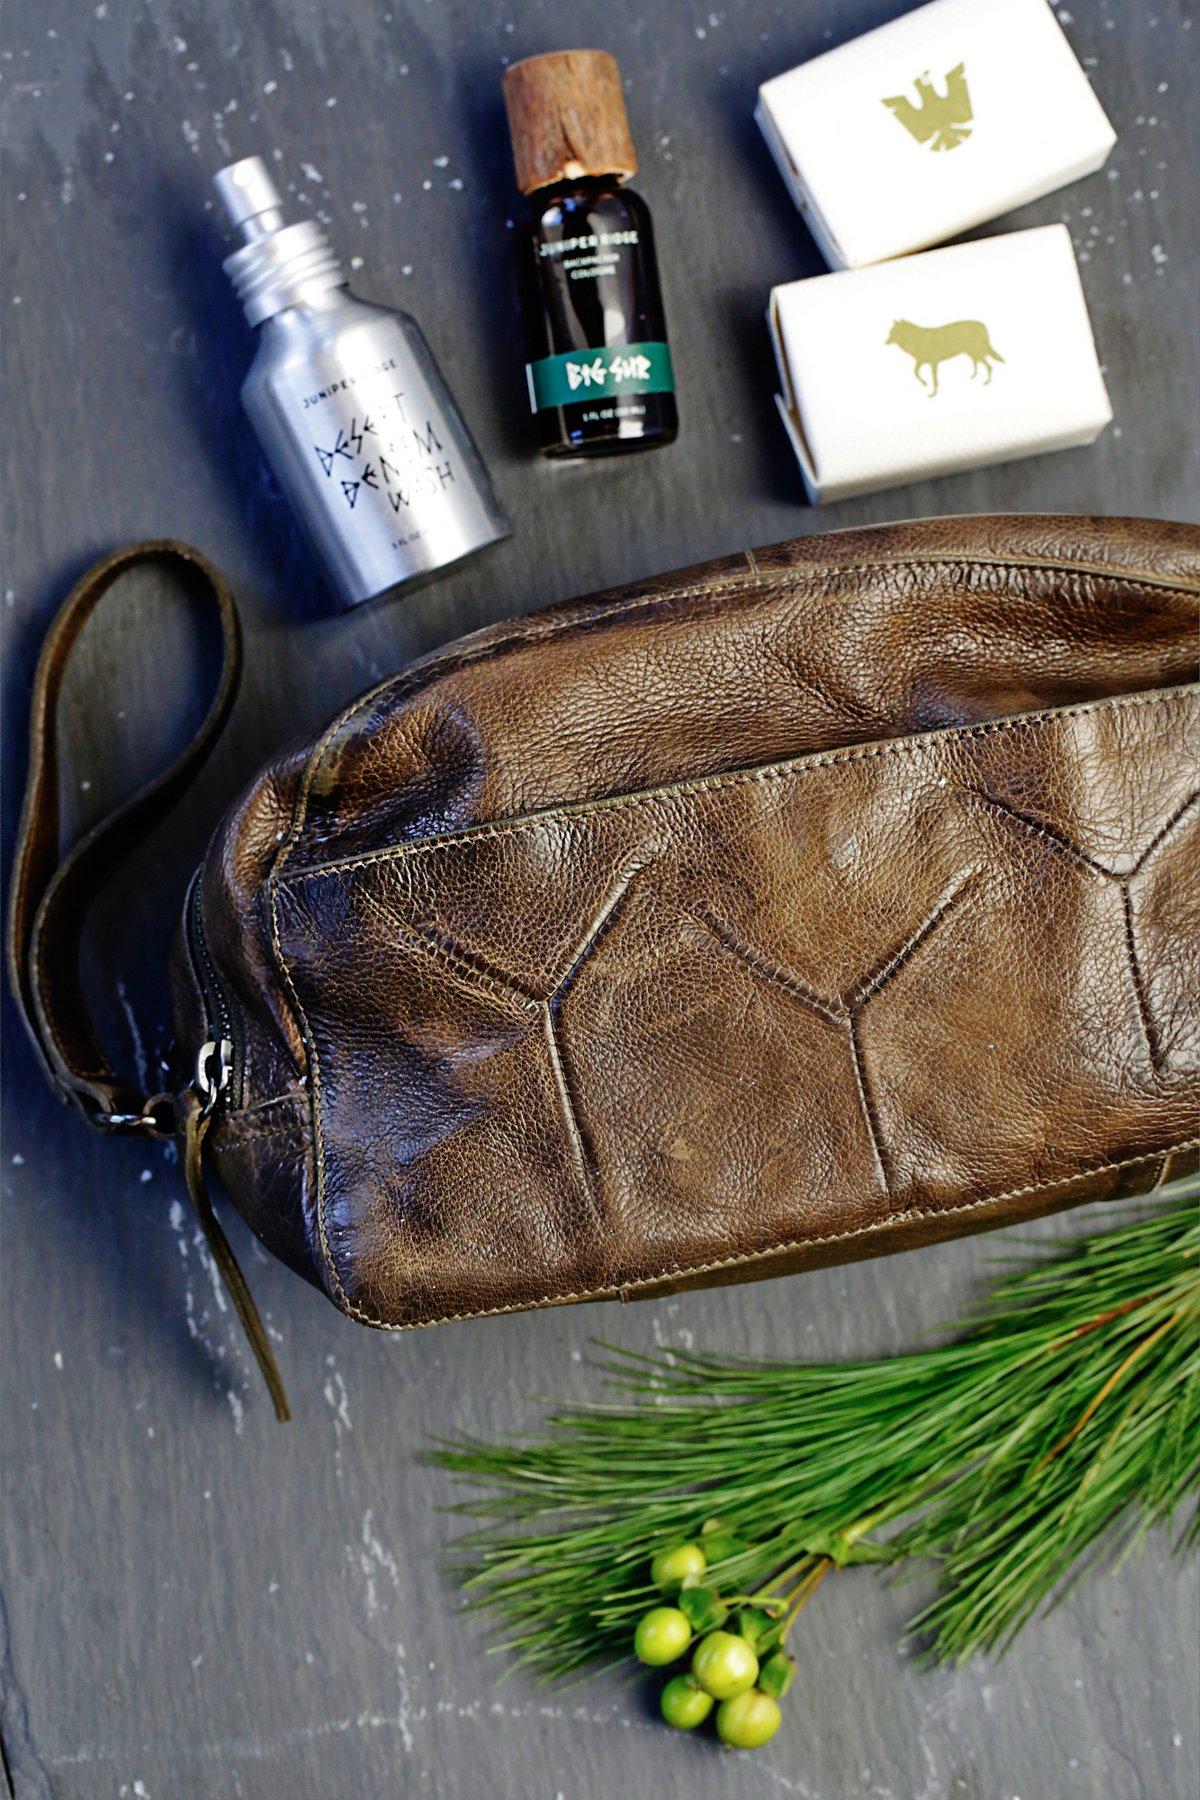 Vera Leather Toiletry Bag